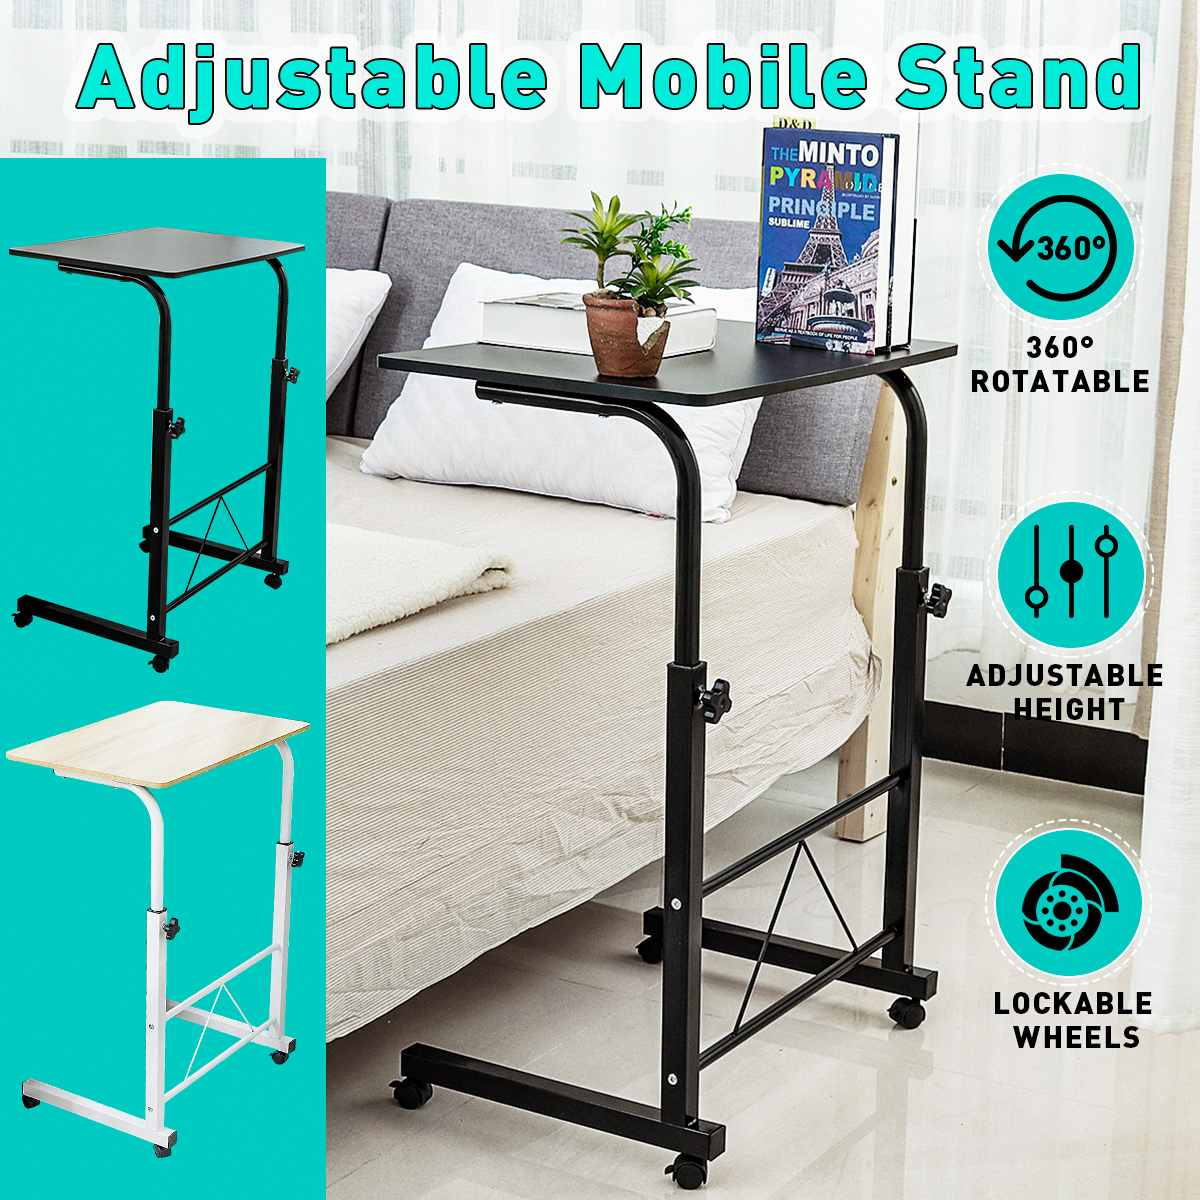 Adjustable Standing Computer Desk Table Portable Laptop Desk Rolling Laptop Table Bedside Sofa Home Office Furniture 60X40cm